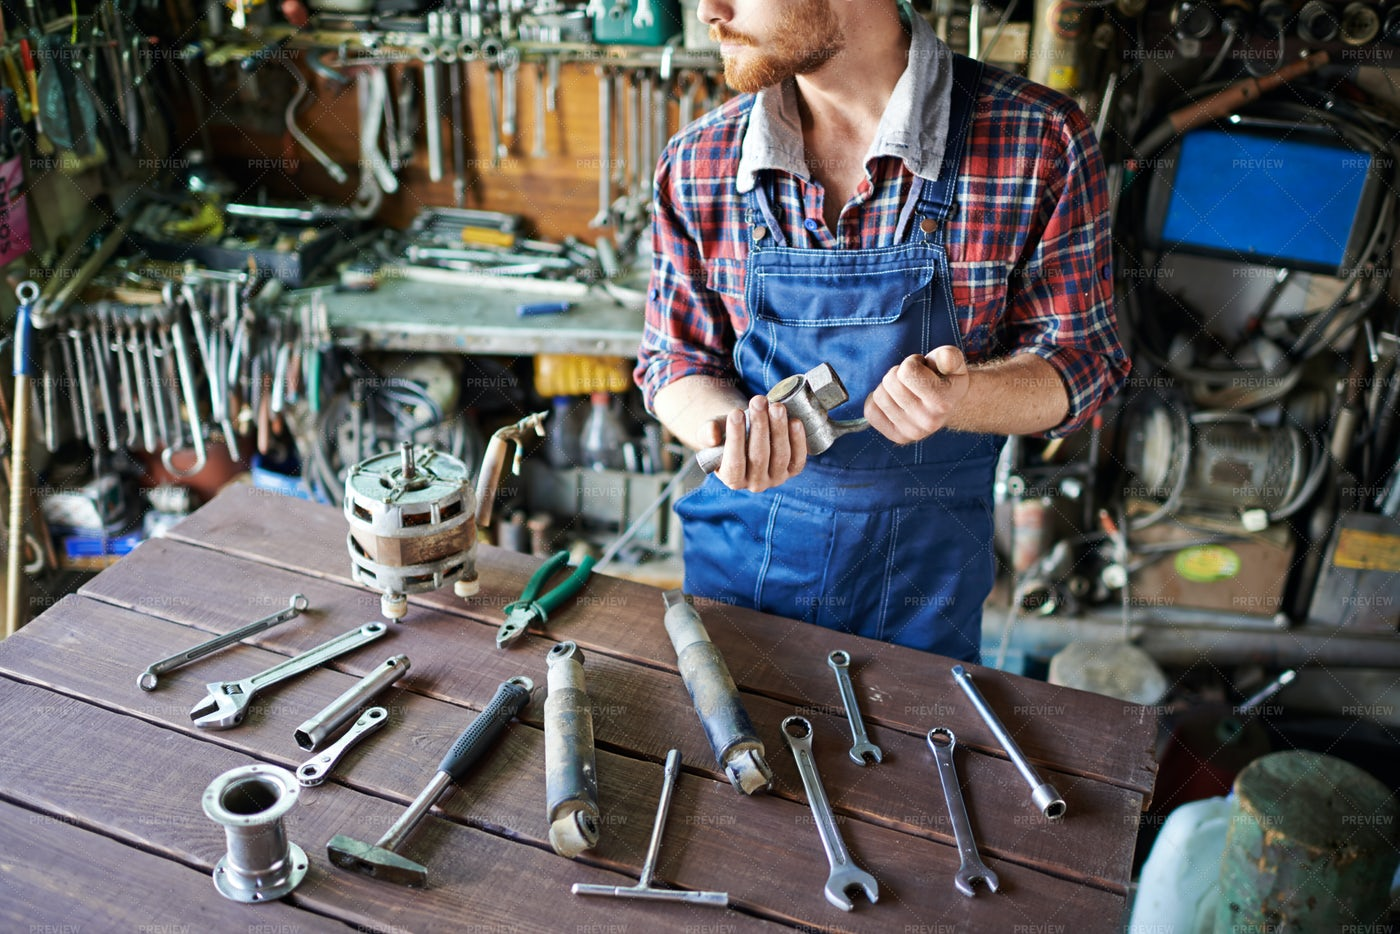 Auto Mechanic Preparing Working Tools: Stock Photos